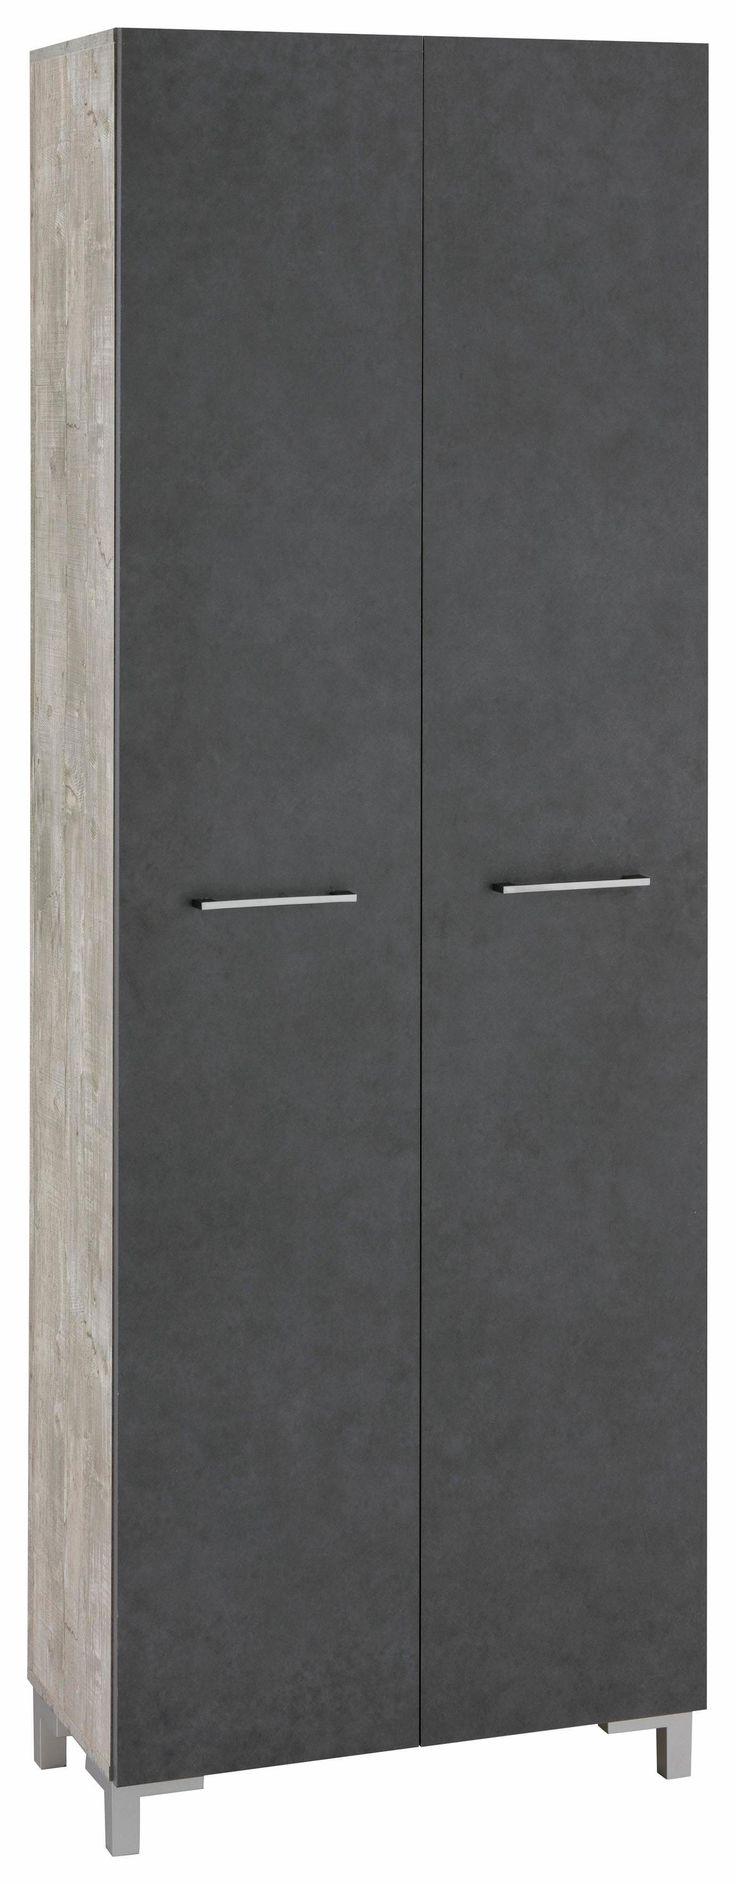 Hochschrank »Pure« grau, yourhome Jetzt bestellen unter: https://moebel.ladendirekt.de/bad/badmoebel/badezimmerschraenke/?uid=257cbc5d-e0ce-5df9-bedd-44bac326c8e2&utm_source=pinterest&utm_medium=pin&utm_campaign=boards #bad #badmoebel #hochschrank #badezimmerschraenke